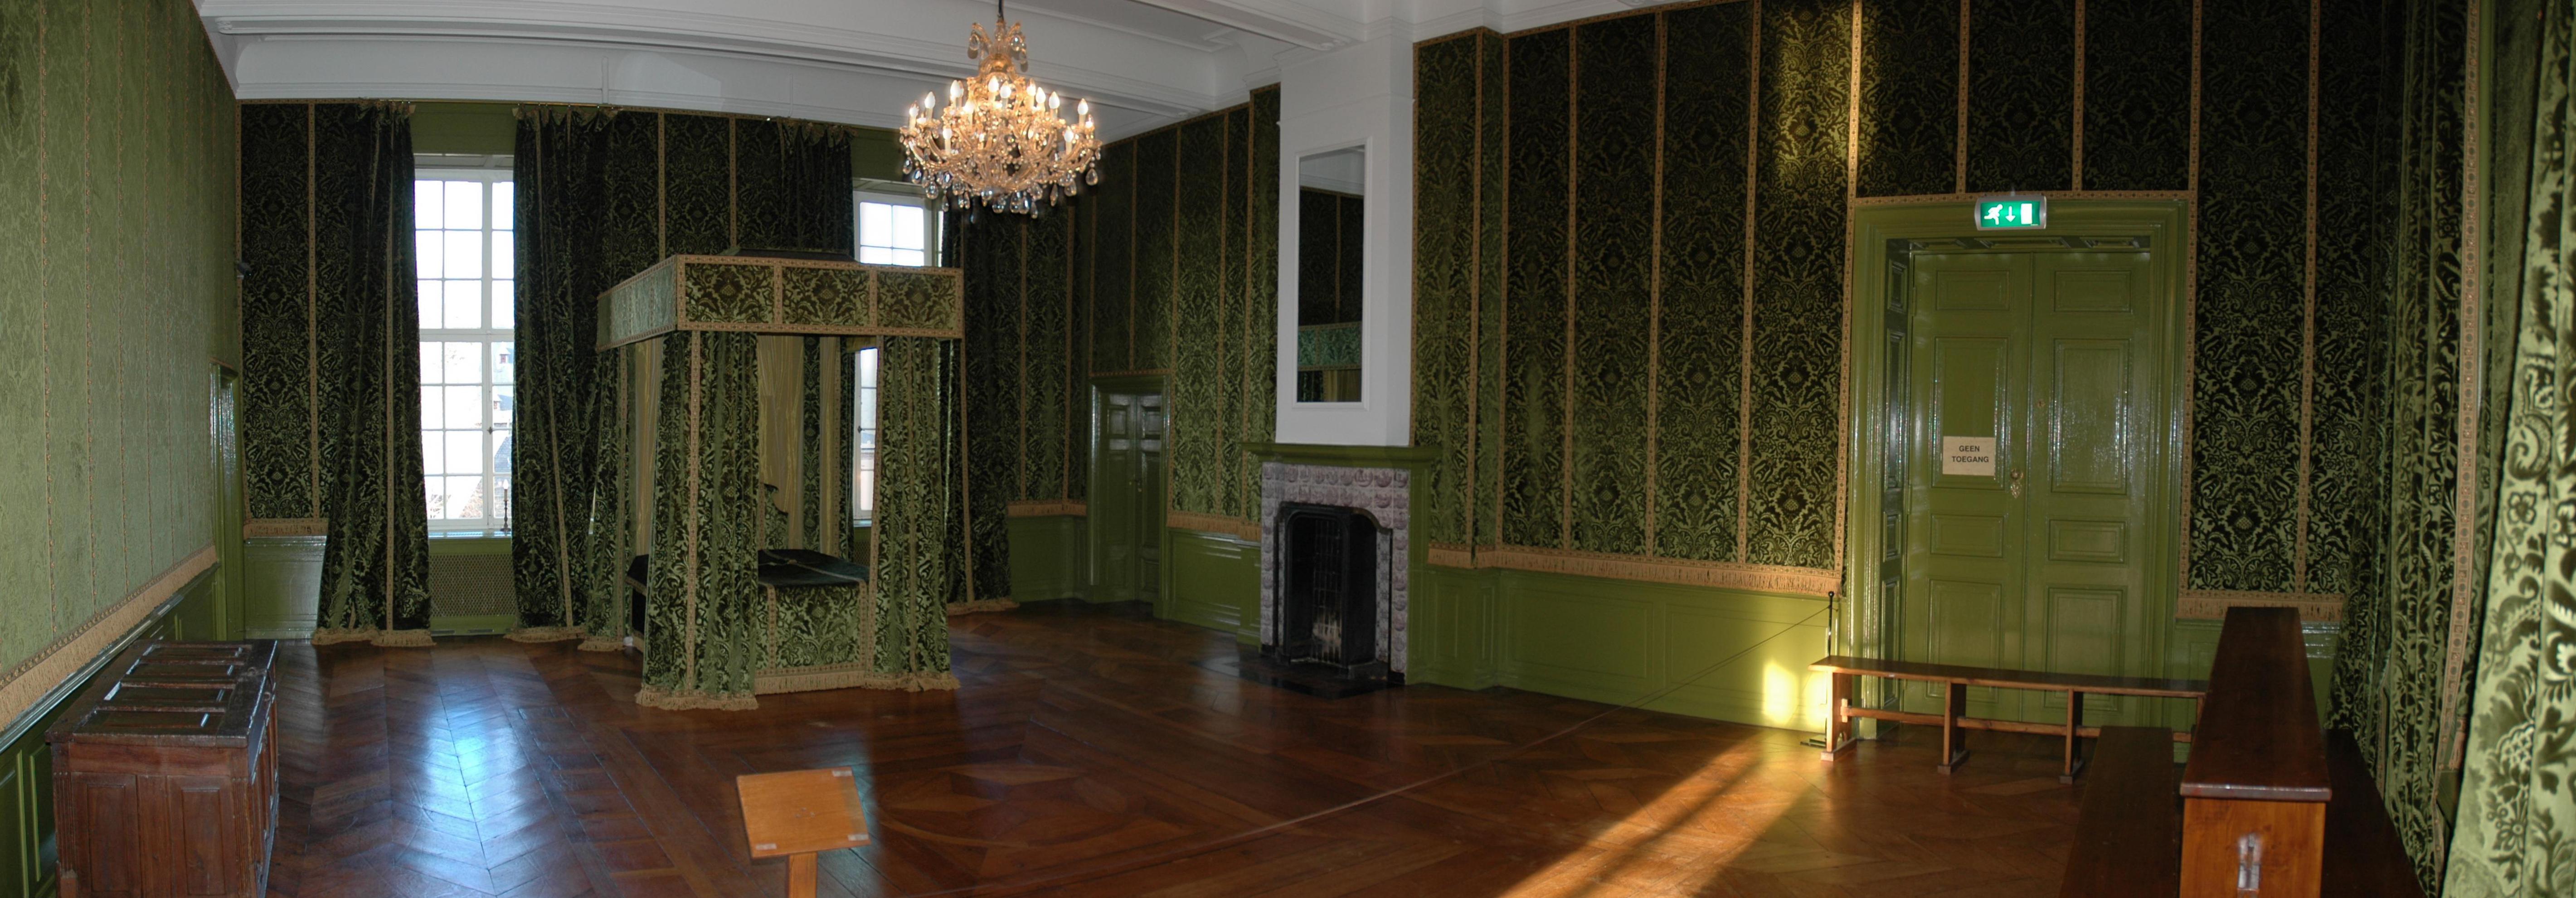 datei schloss hoensbroek gruenes zimmer wikipedia. Black Bedroom Furniture Sets. Home Design Ideas